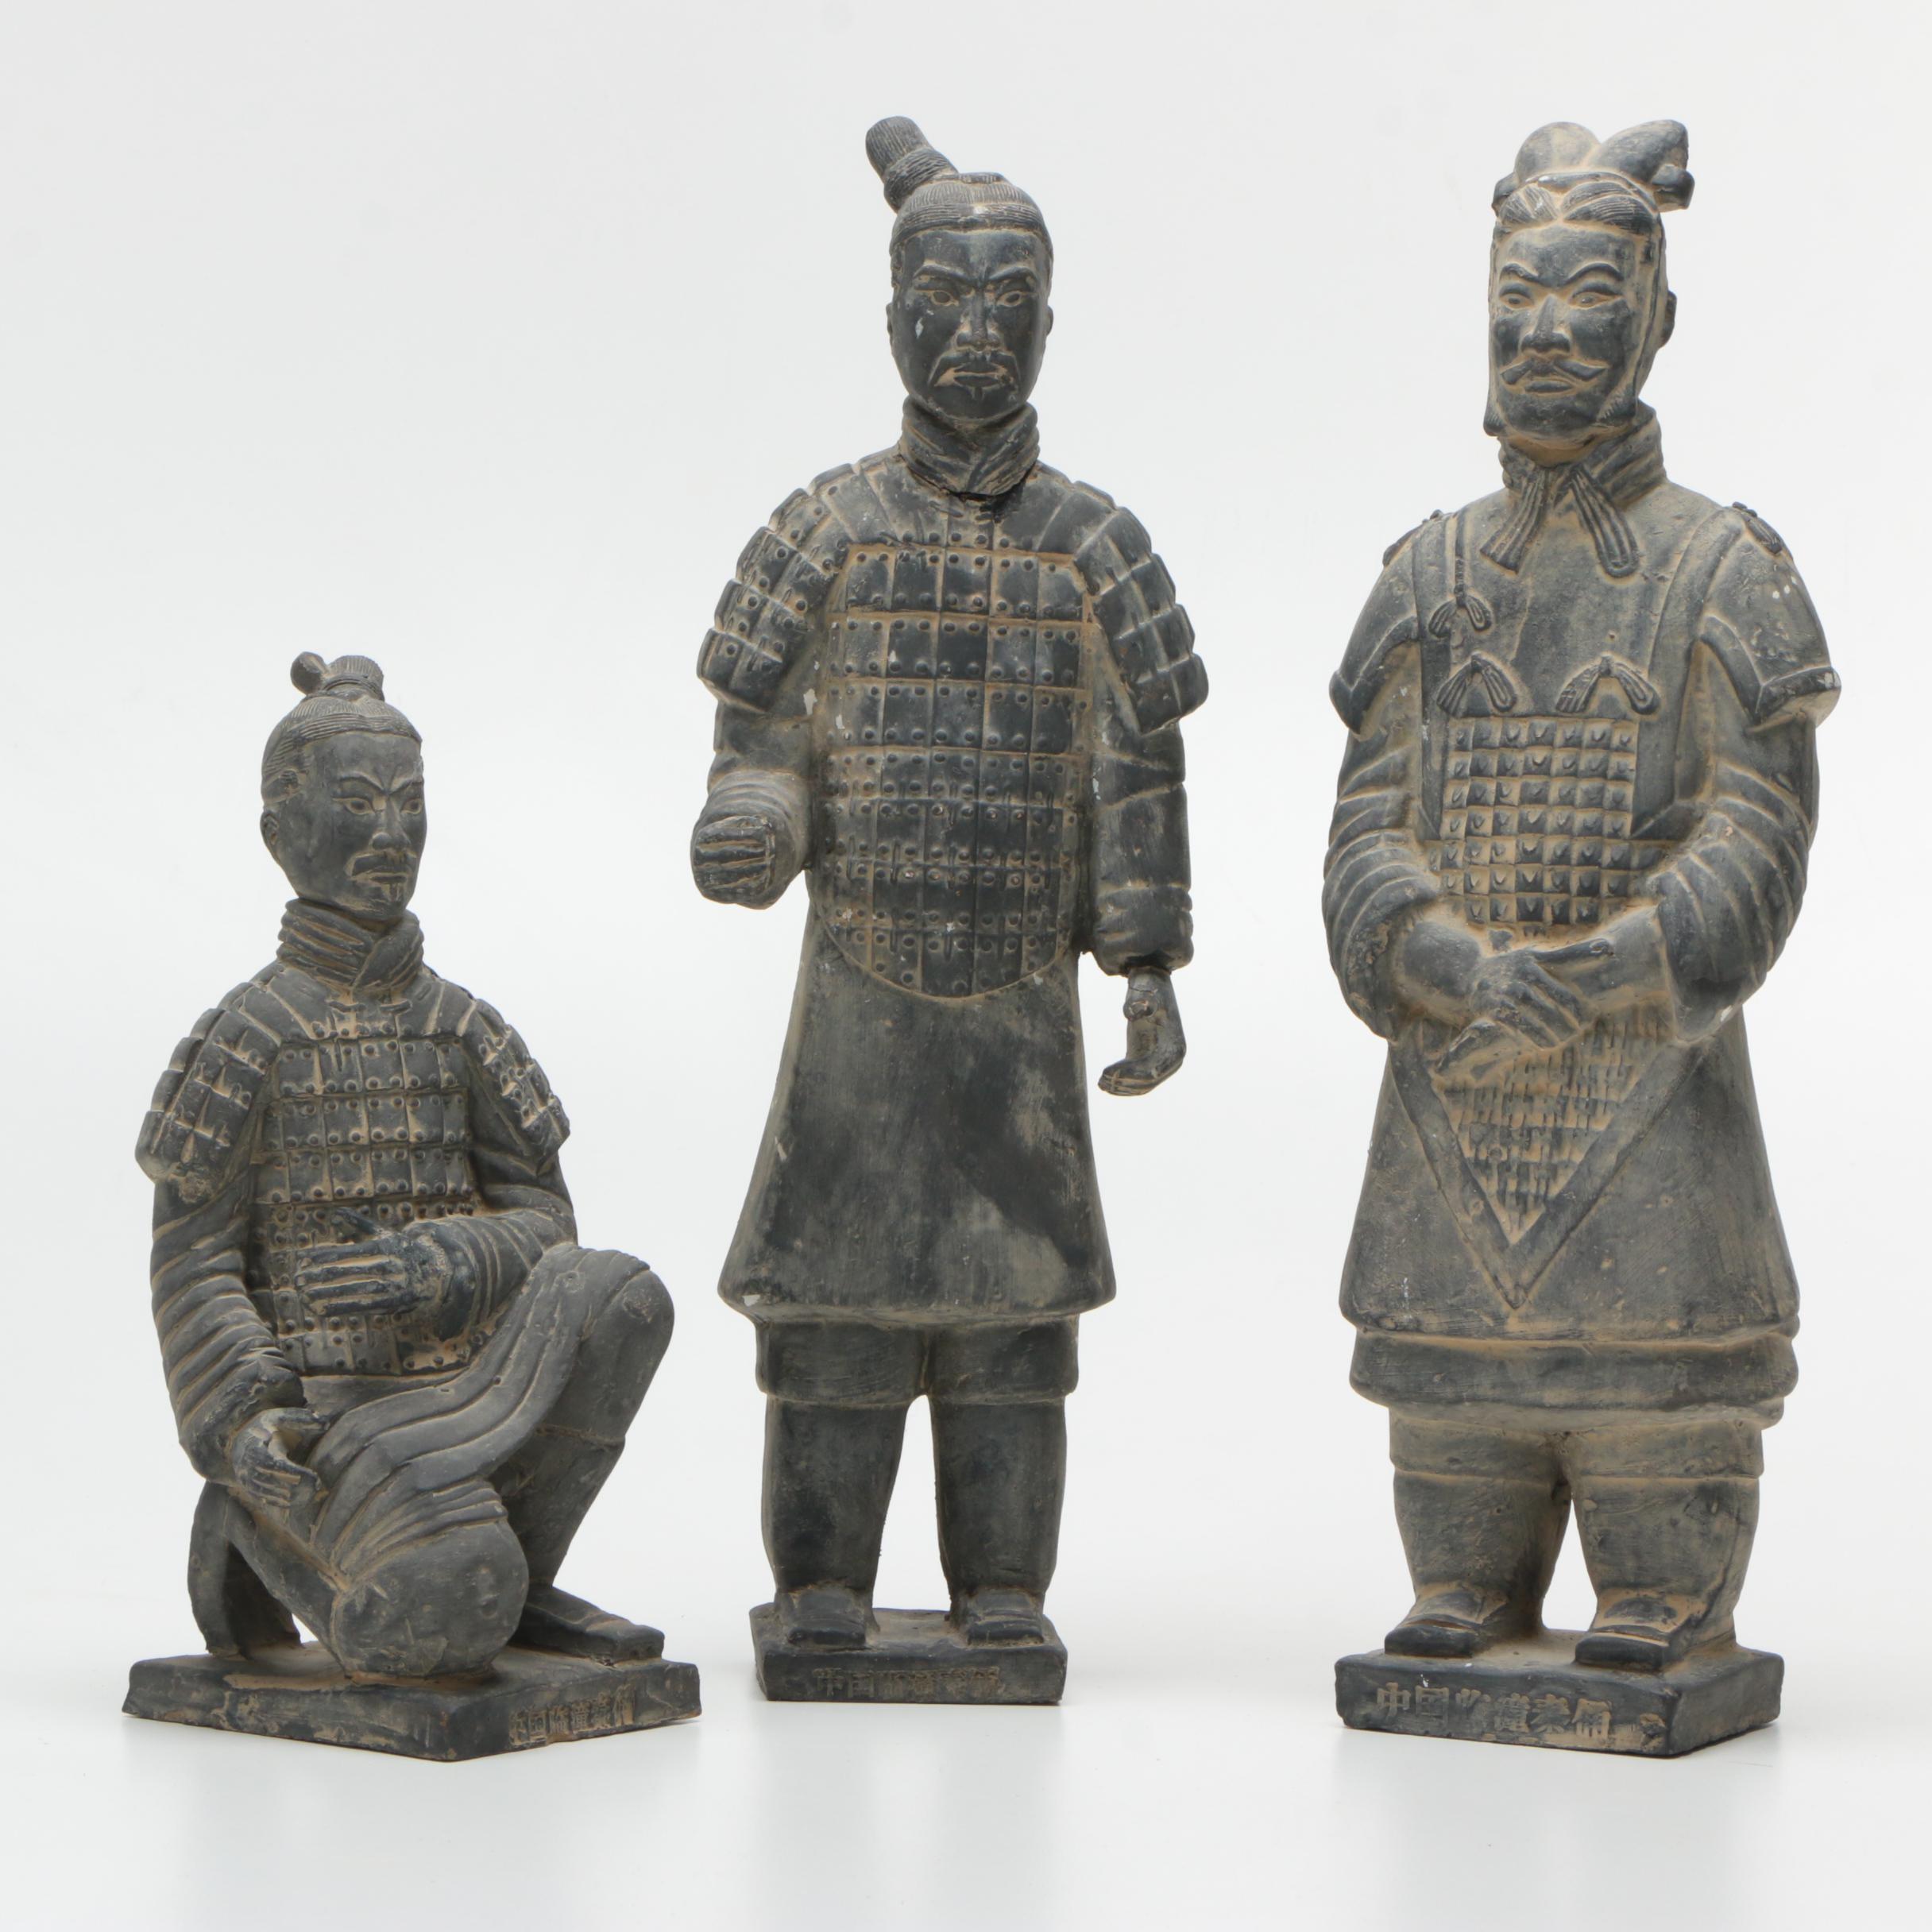 Terracotta Army Replica Figurines